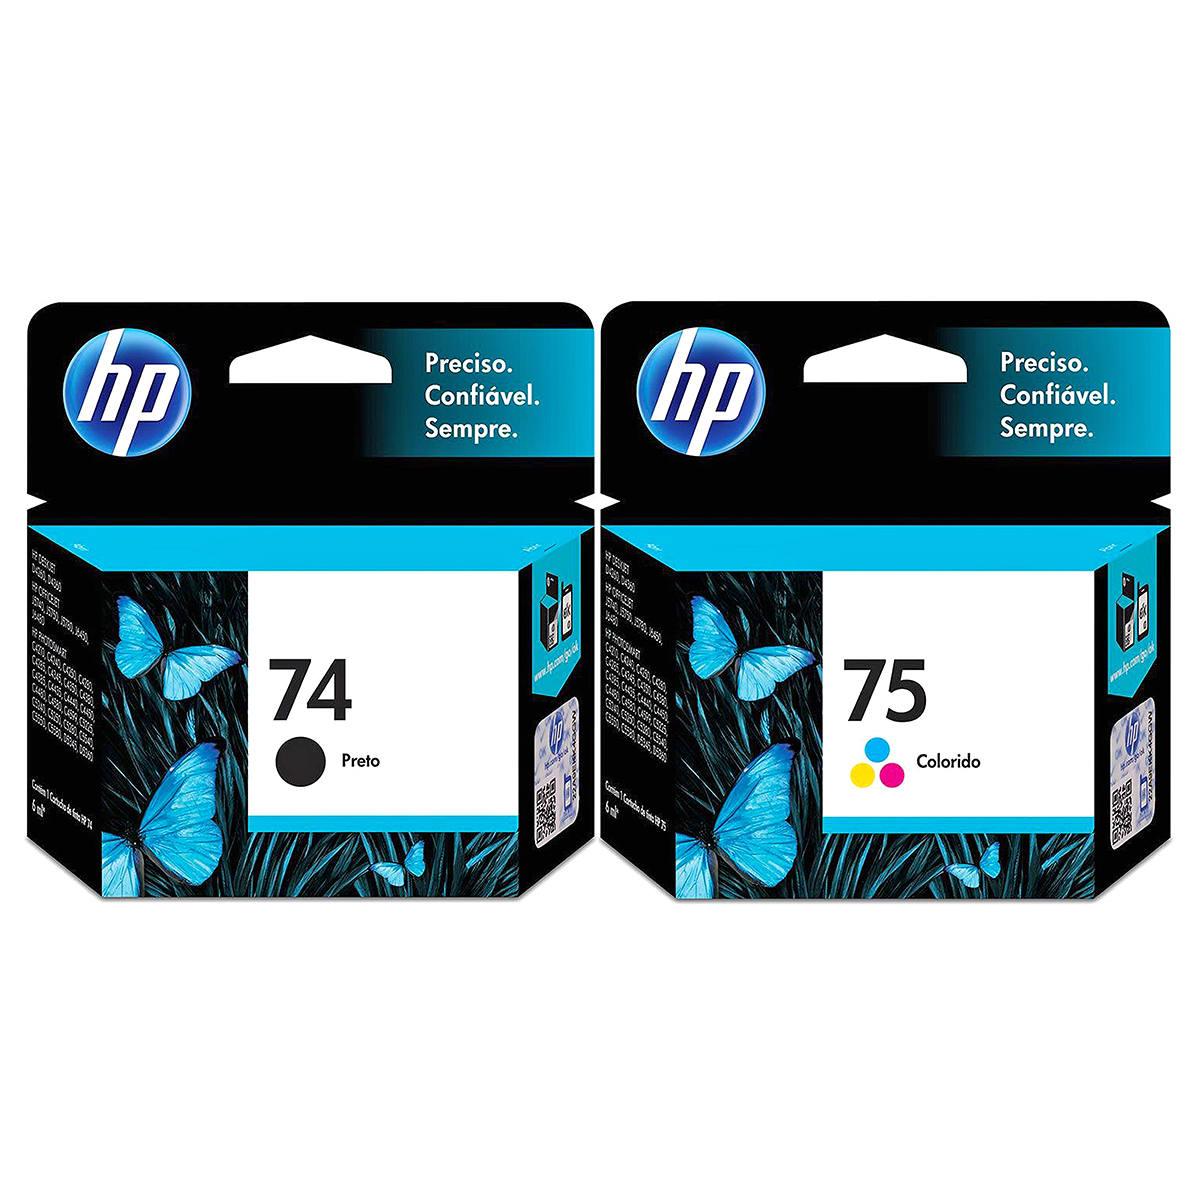 Kit Cartucho de Tinta HP 74 Preto + 75 Colorido para HP Photosmart C4280 C4480 C5280 C4424 Officejet J6424 Original